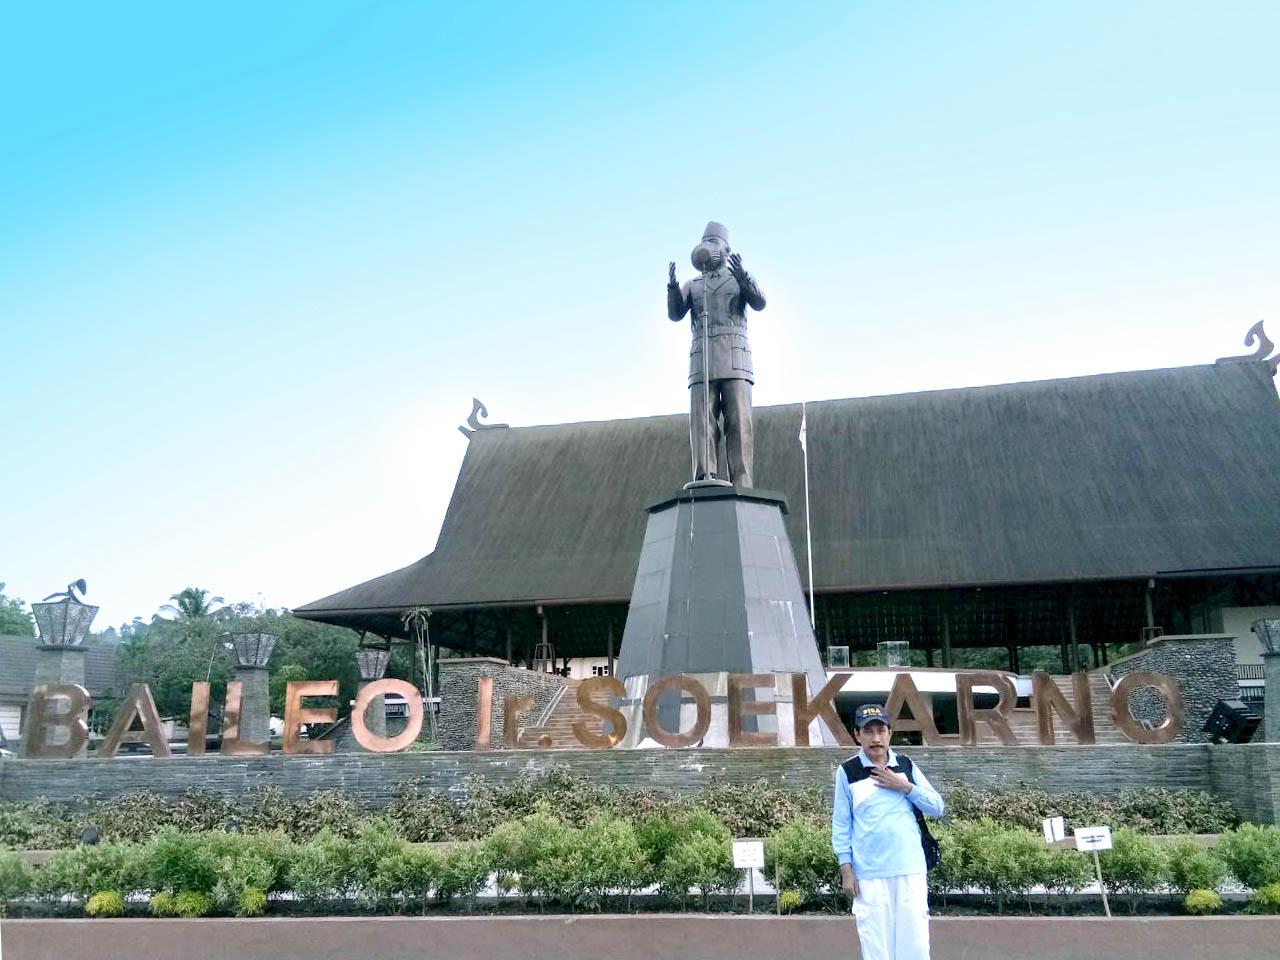 Bung Karno Beri Nama Masohi Kota Gotong Royong, Kini Bersih dan Indah